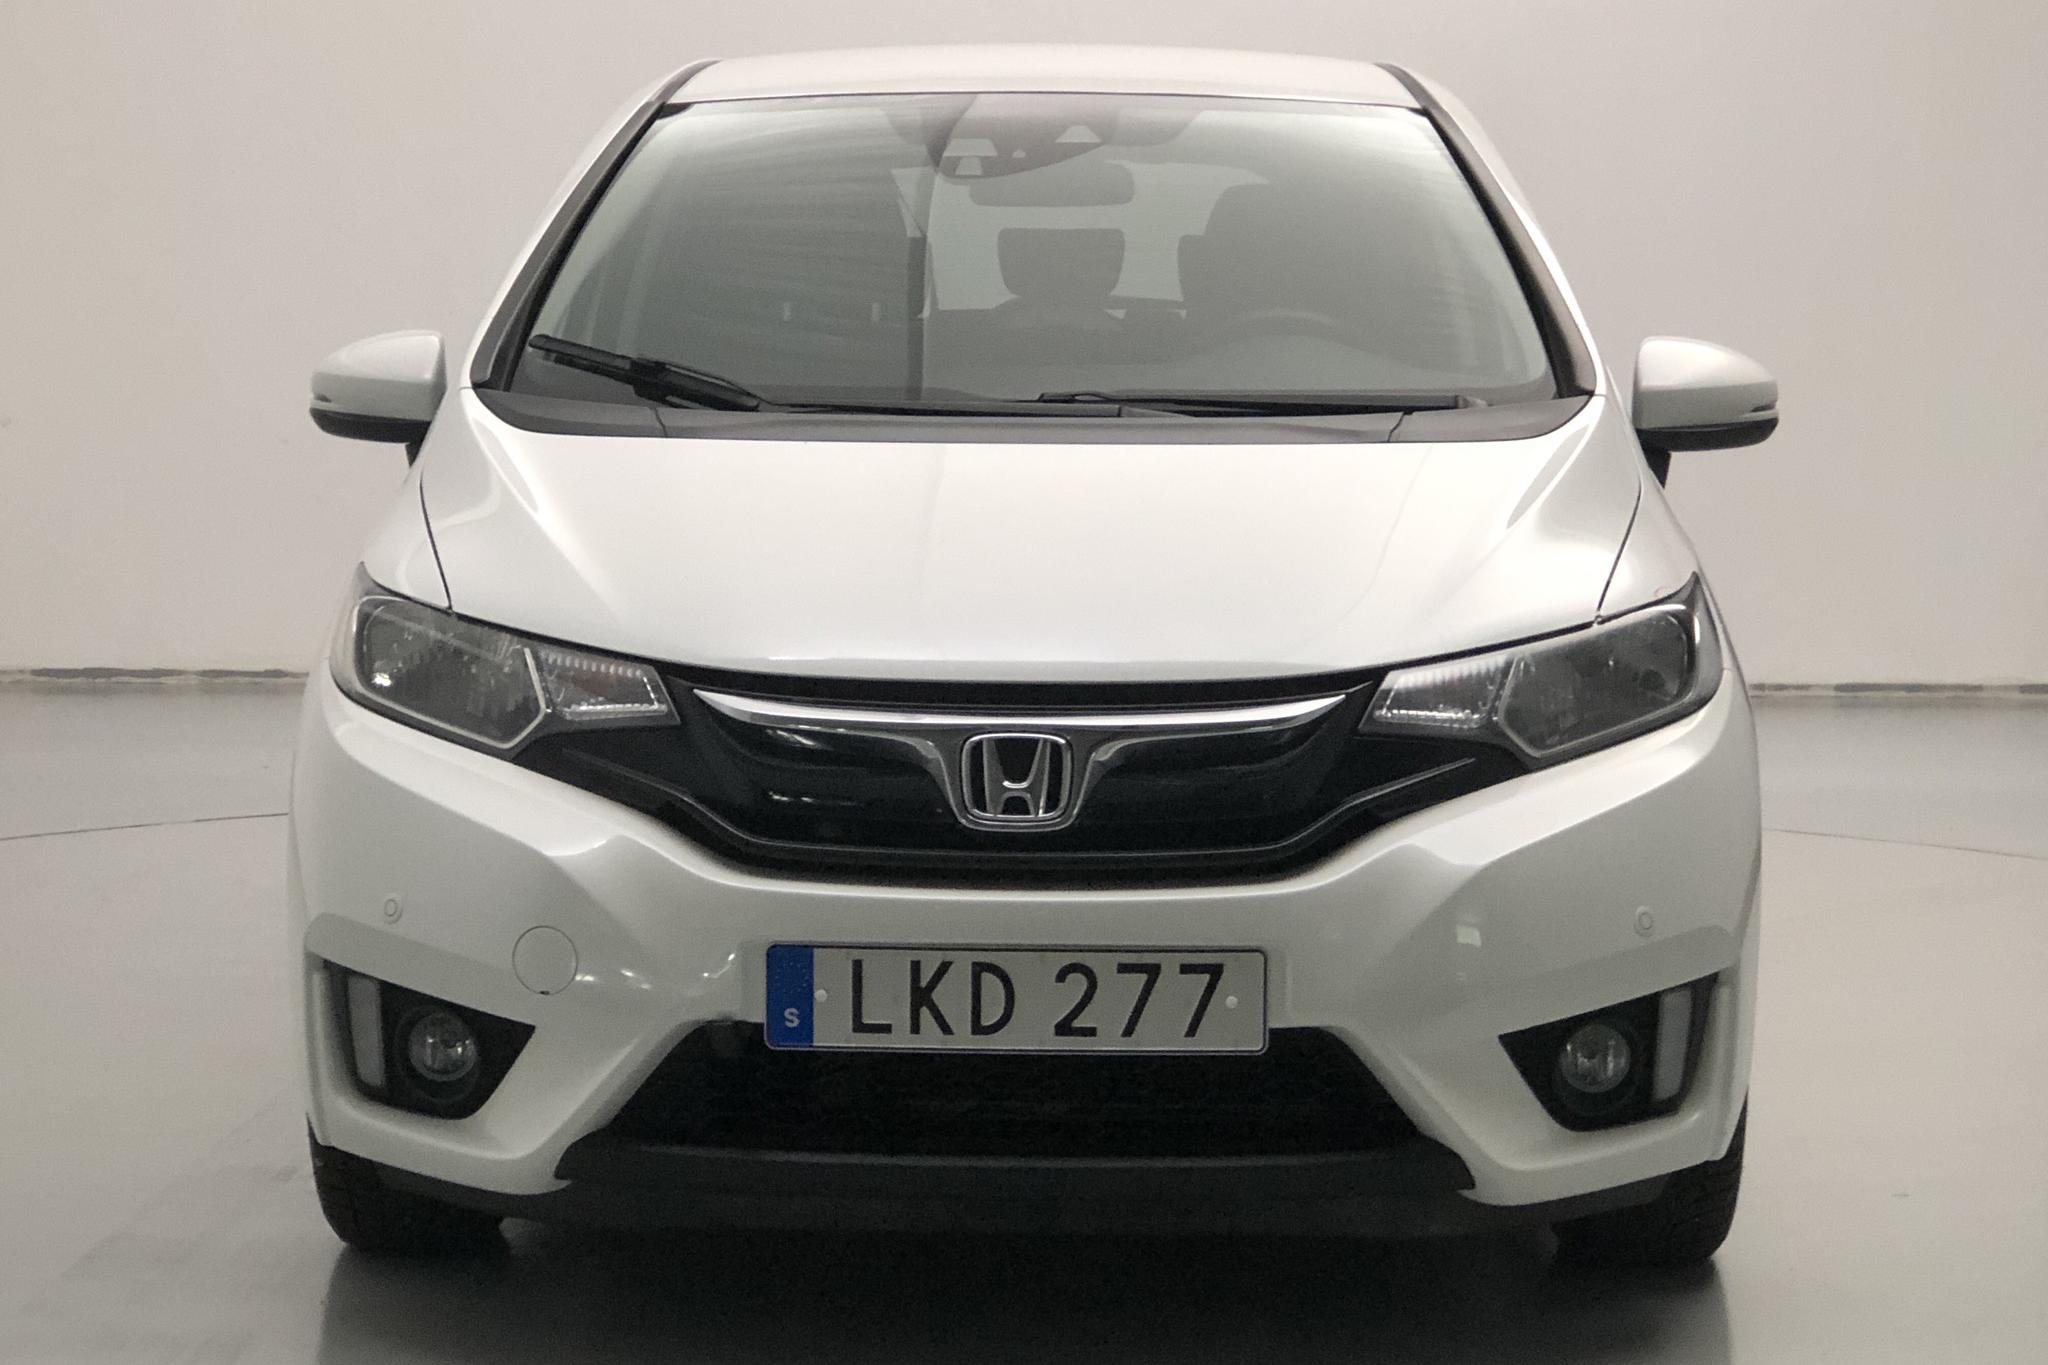 Honda Jazz 1.3 (102hk) - 71 200 km - Automatic - white - 2016